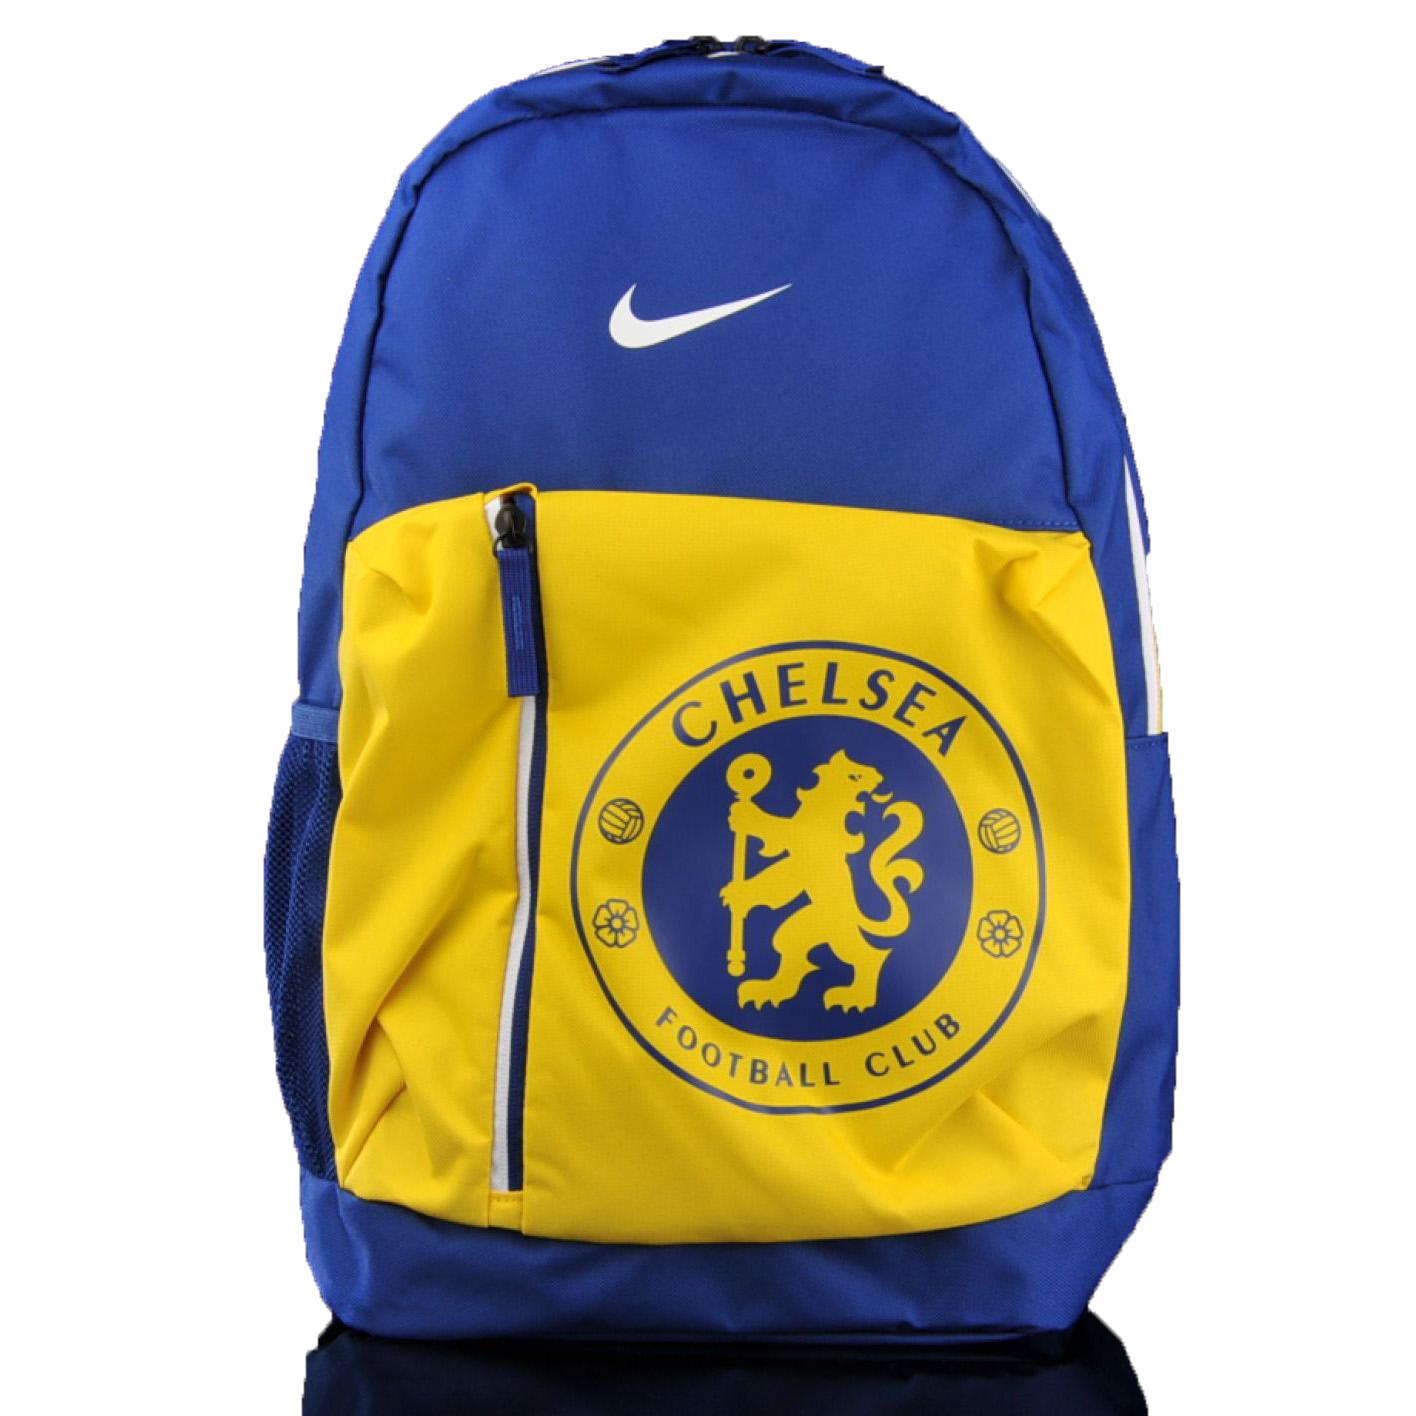 c5359273c739 Nike Stadium FC Chelsea 2018-19 Backpack - Soccer Shop London Chelsea  Merchandise - Superfanas.lt